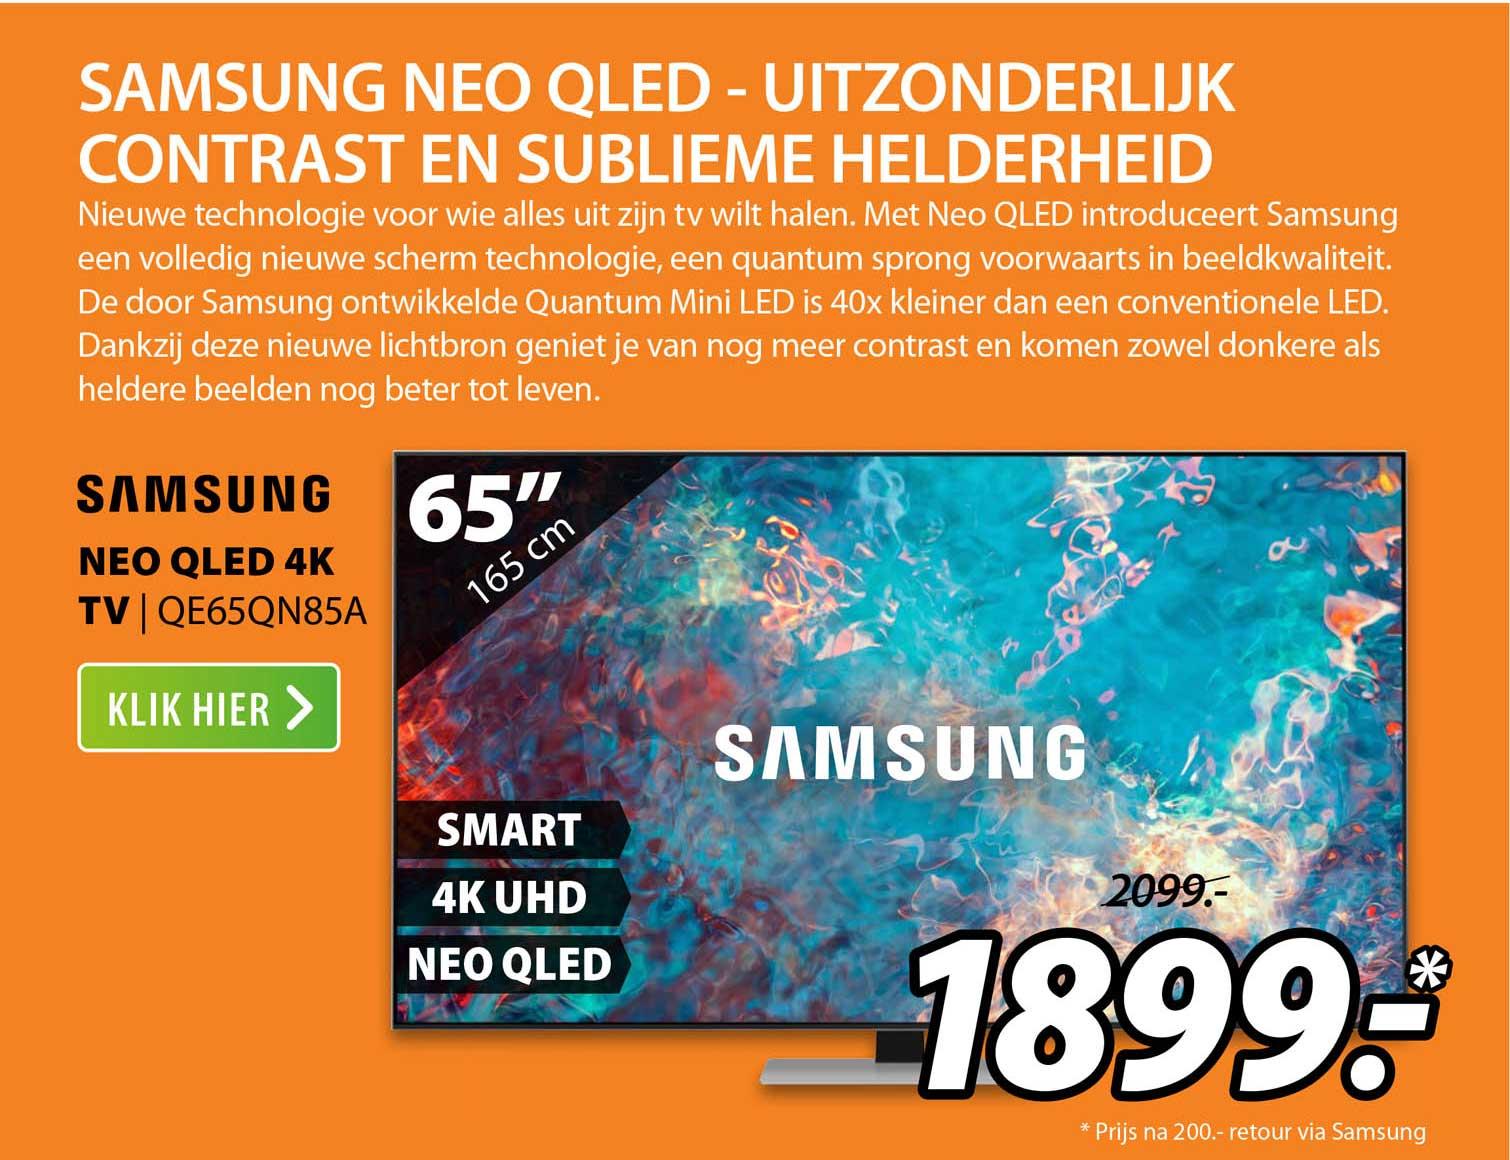 Expert Samsung Neo QLED 4K TV   QE65QN85A